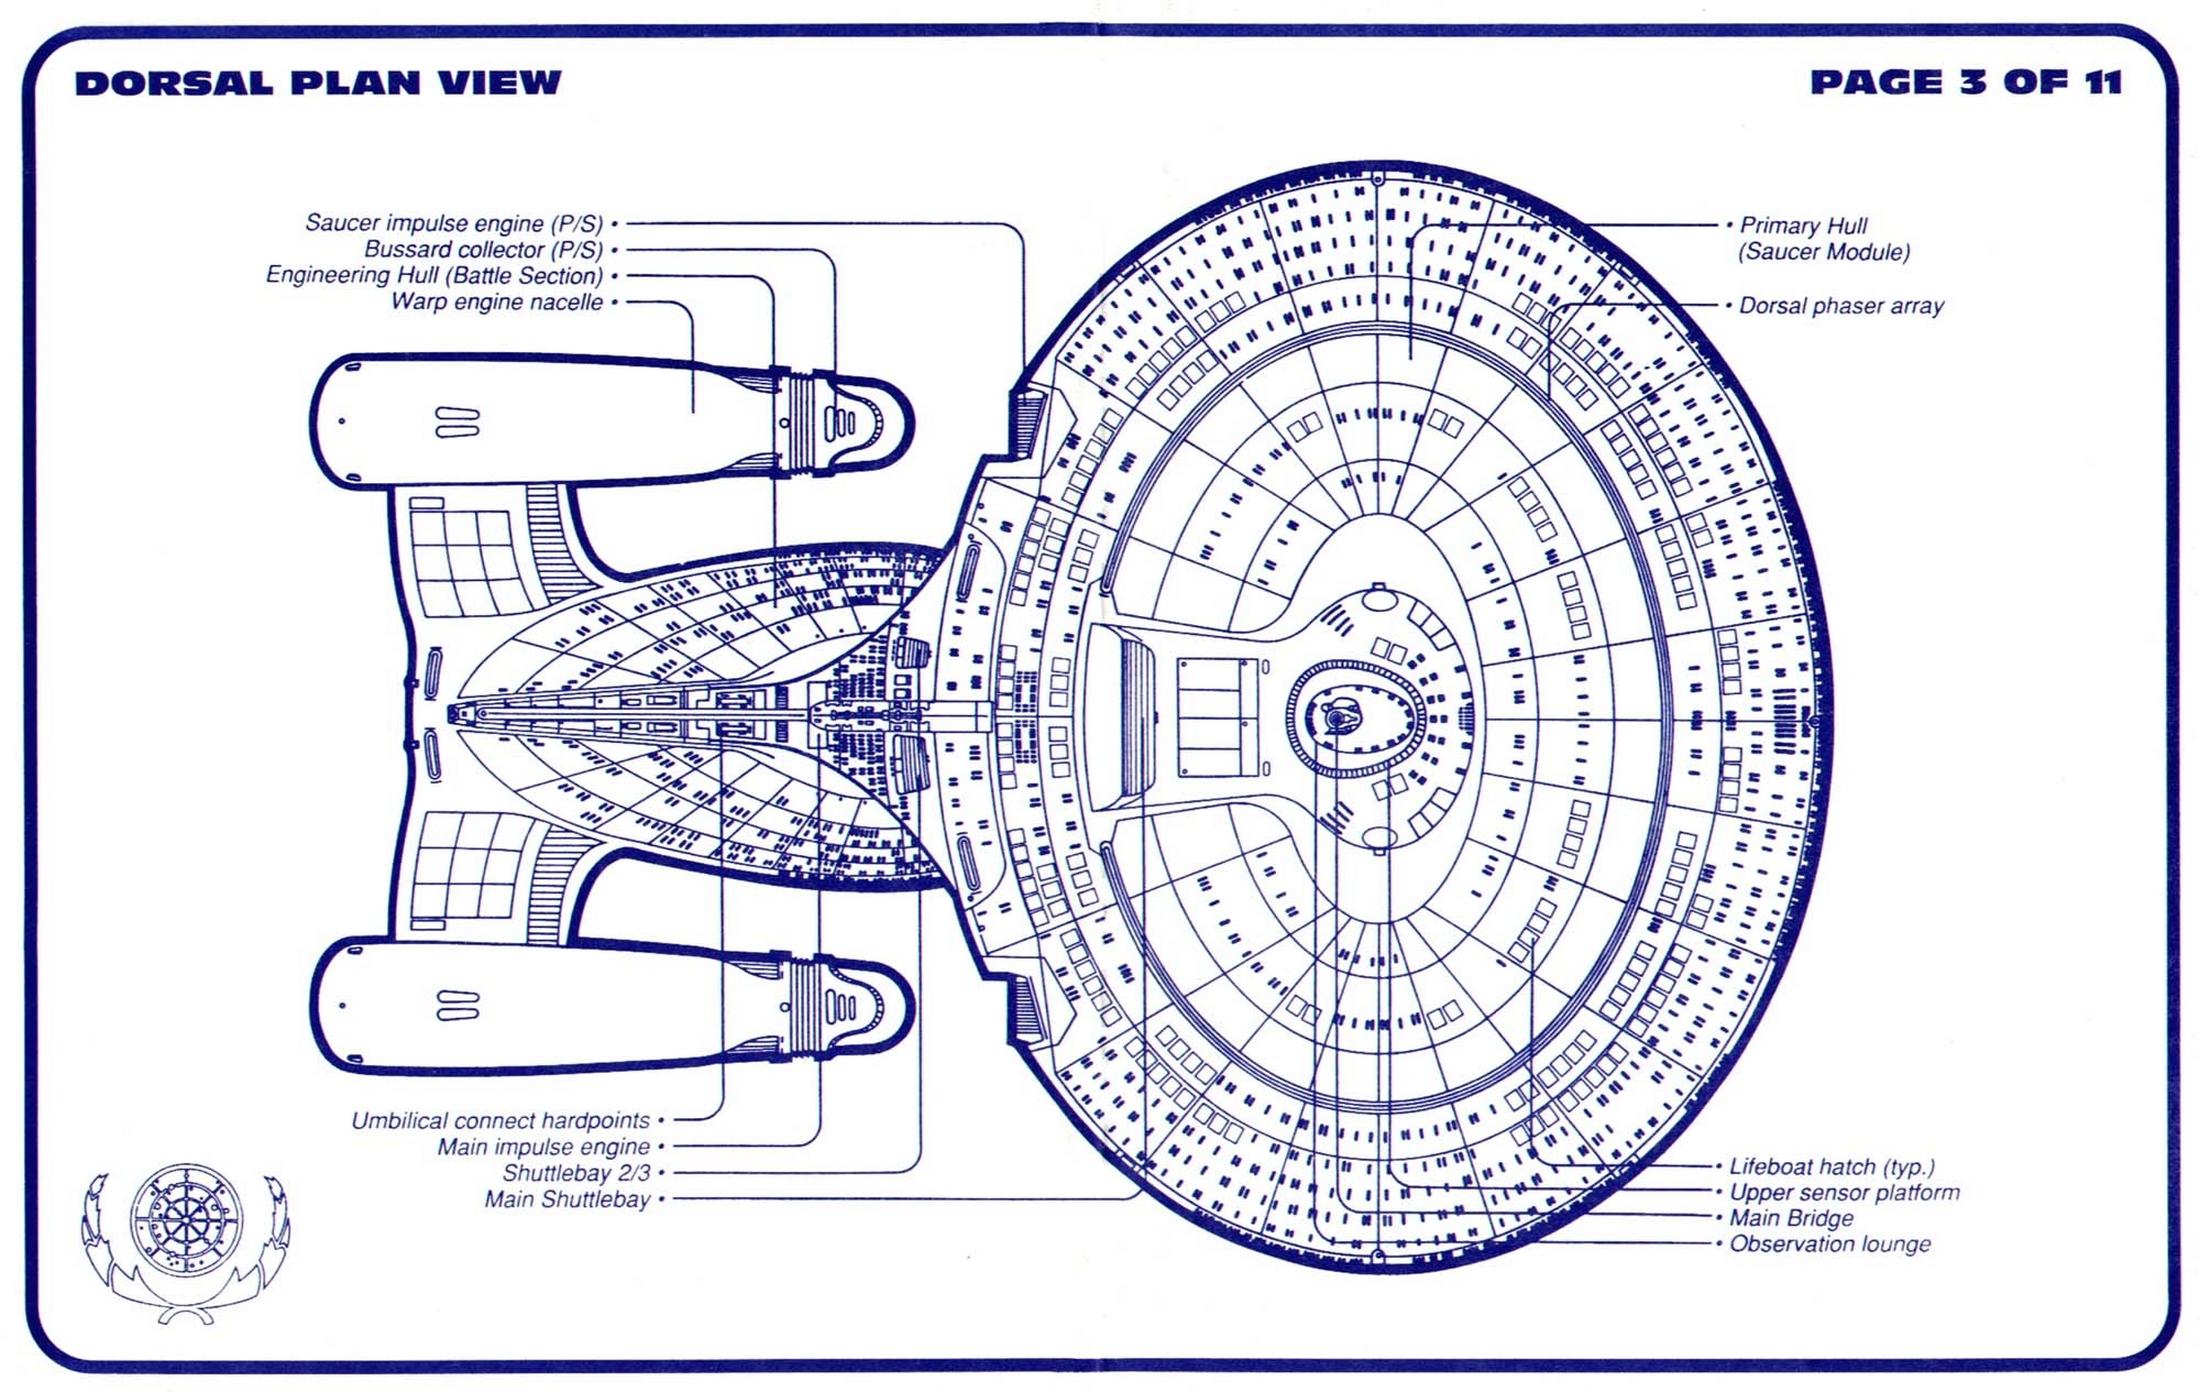 uss enterprise diagram car mate trailer wiring star trek ncc 1701 d blueprints schematics top side